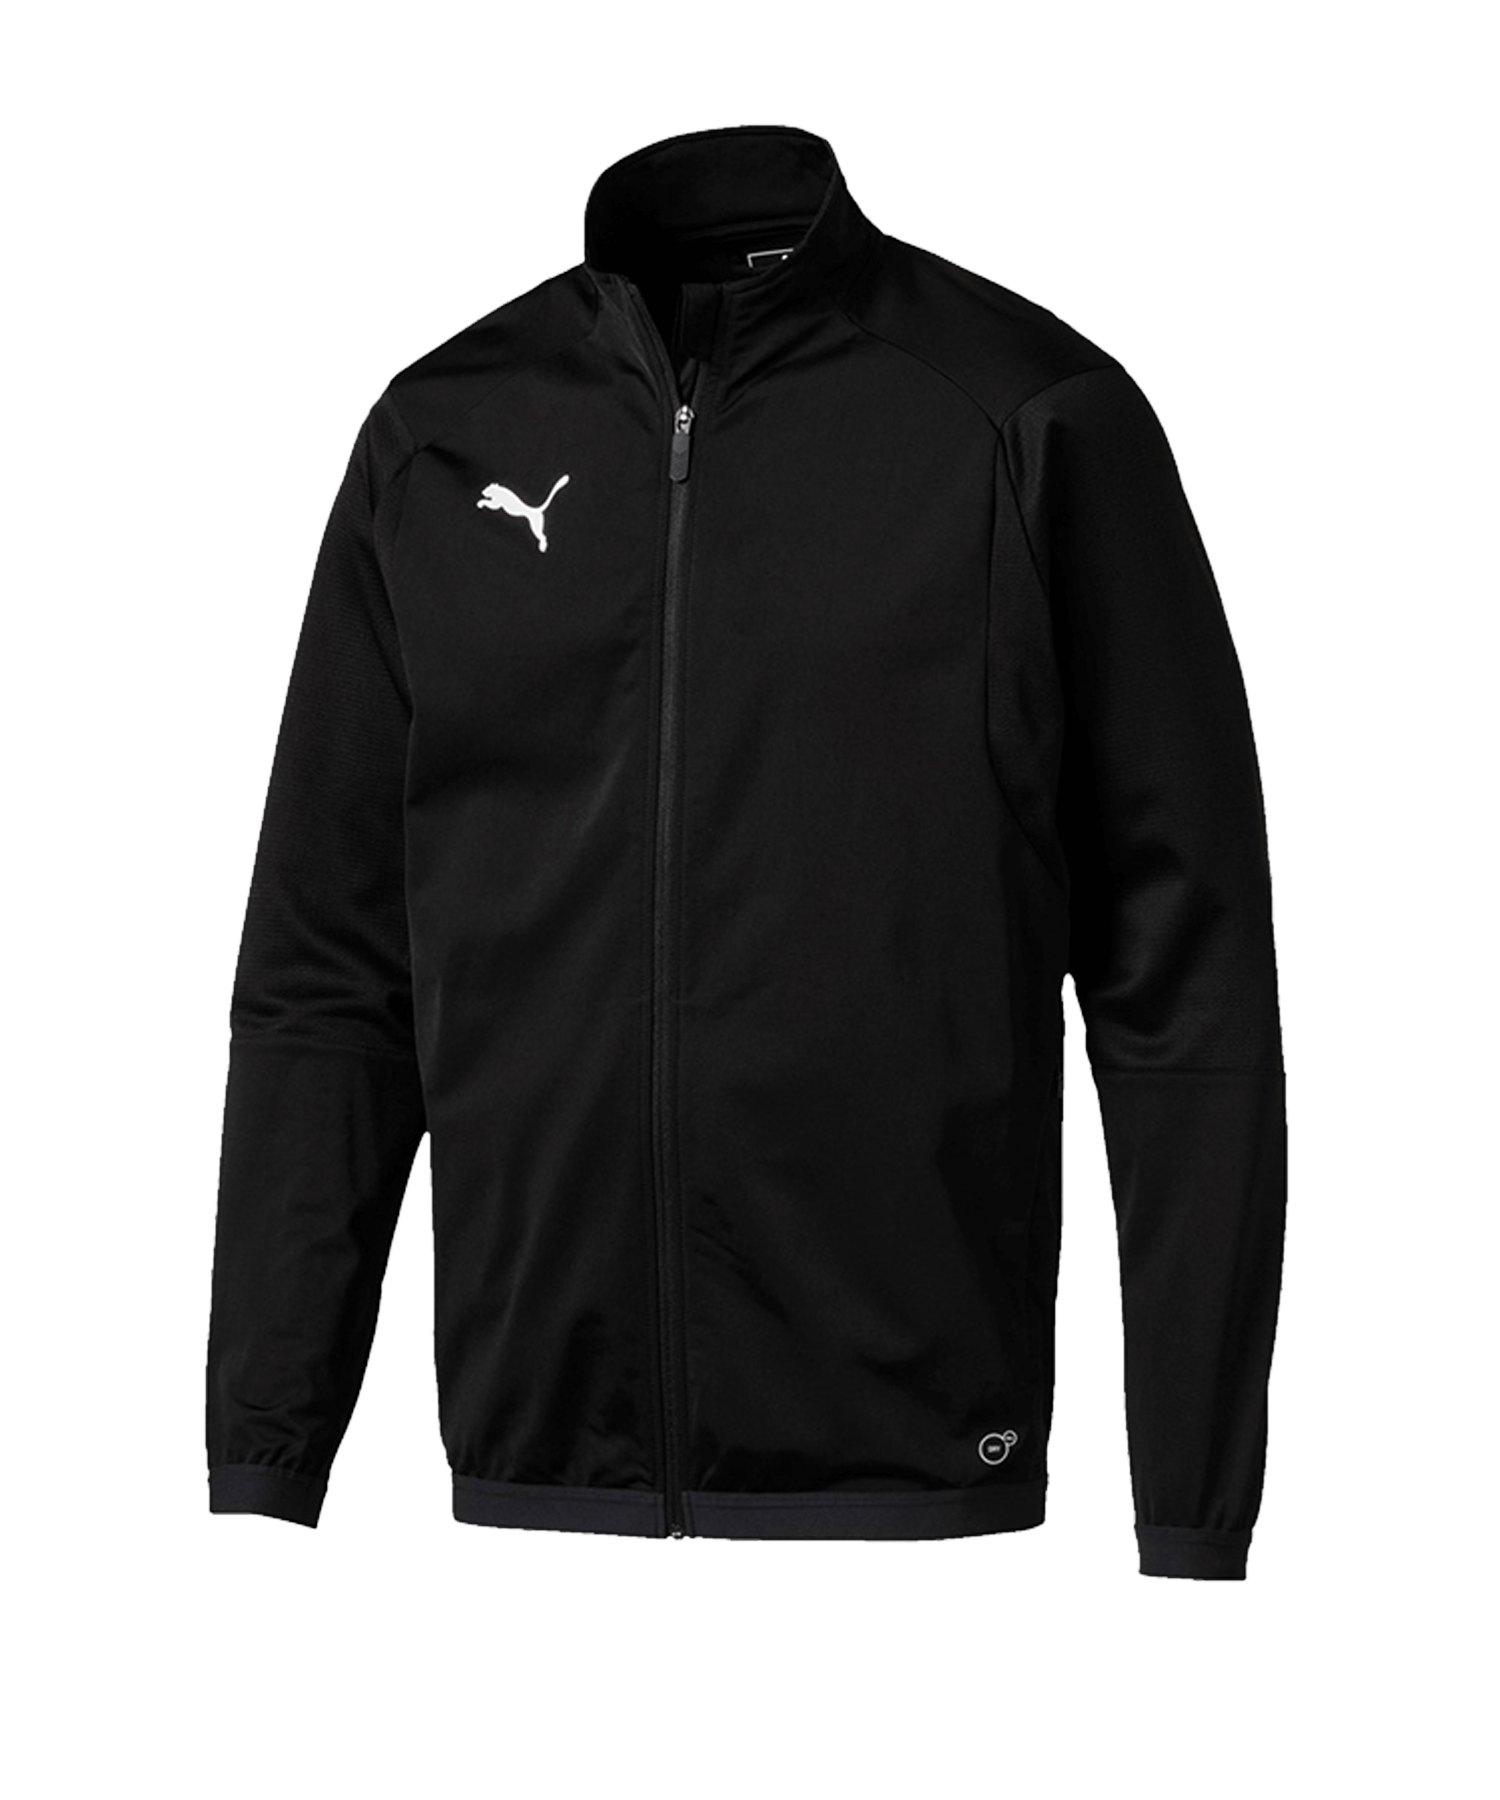 PUMA LIGA Training Jacket Trainingsjacke F03 - schwarz